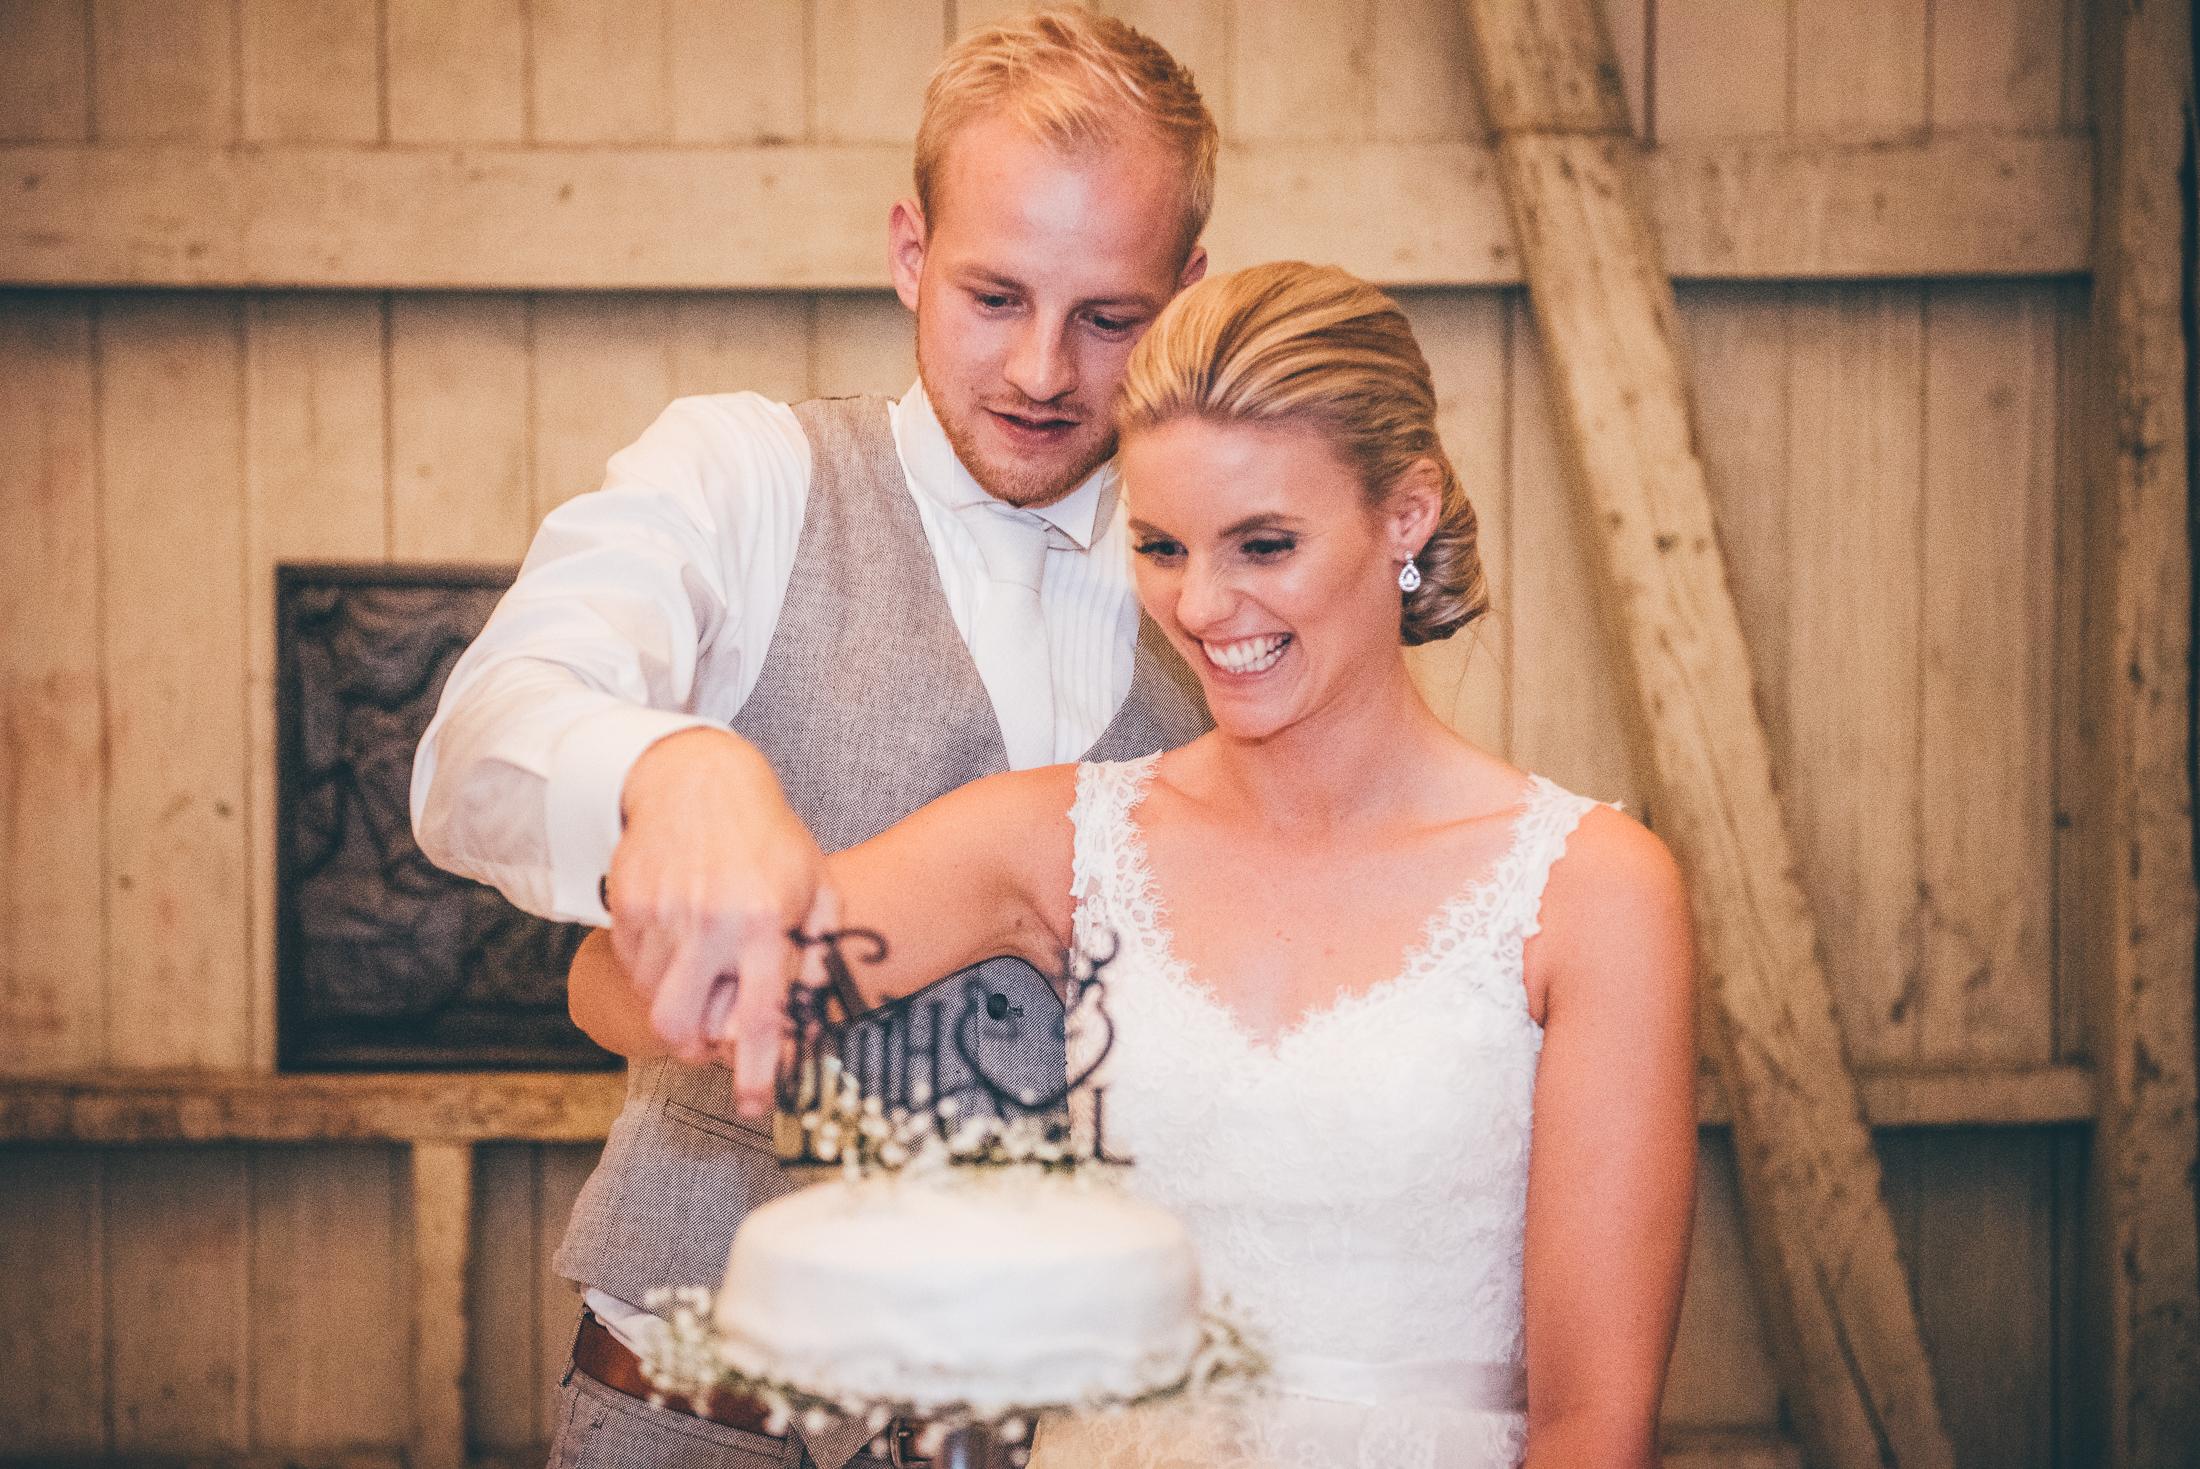 bröllop_linda_robin43.jpg